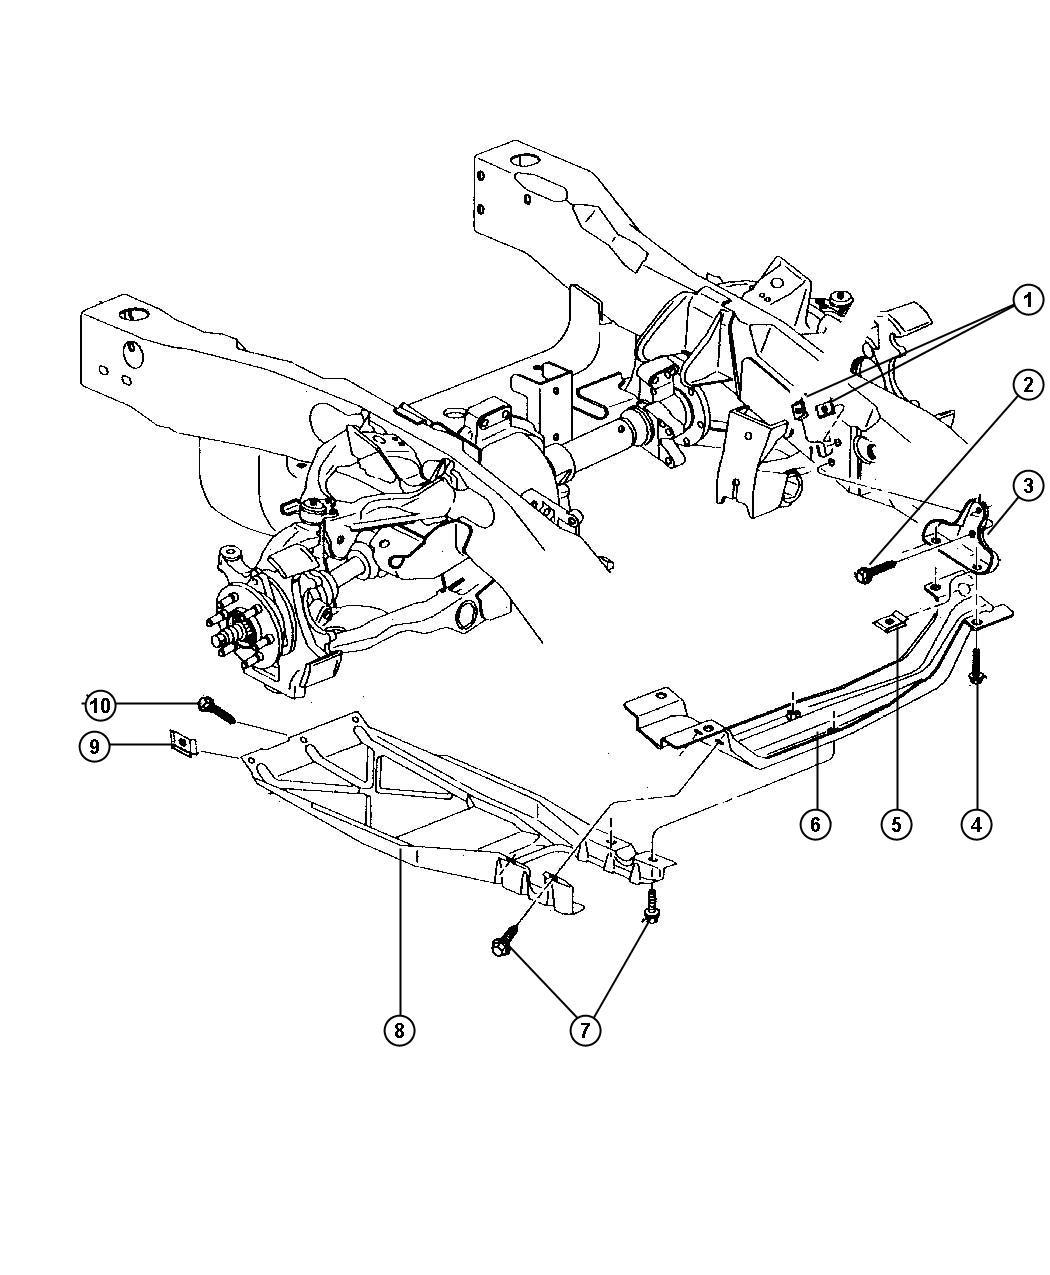 Dodge Ram Crossmember Front Axle Skid Plate